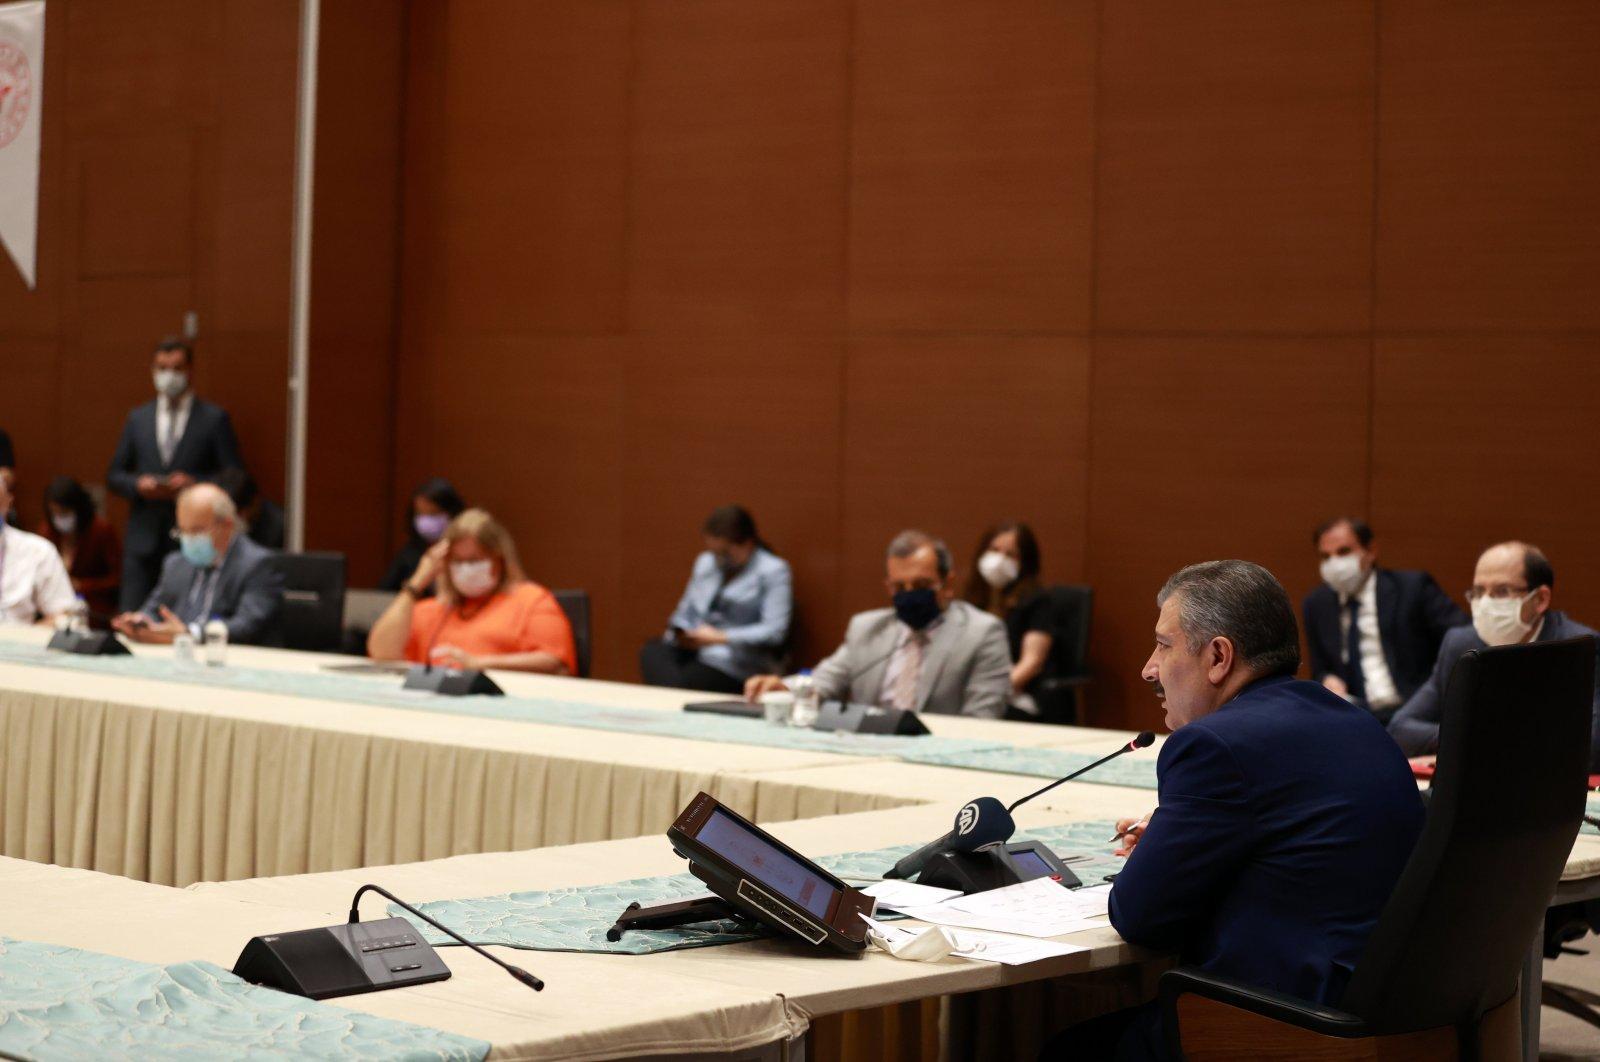 Health Minister Fahrettin Koca speaks after a meeting of the Coronavirus Scientific Advisory Board, in the capital Ankara, Turkey, July 30, 2020. (AA PHOTO)